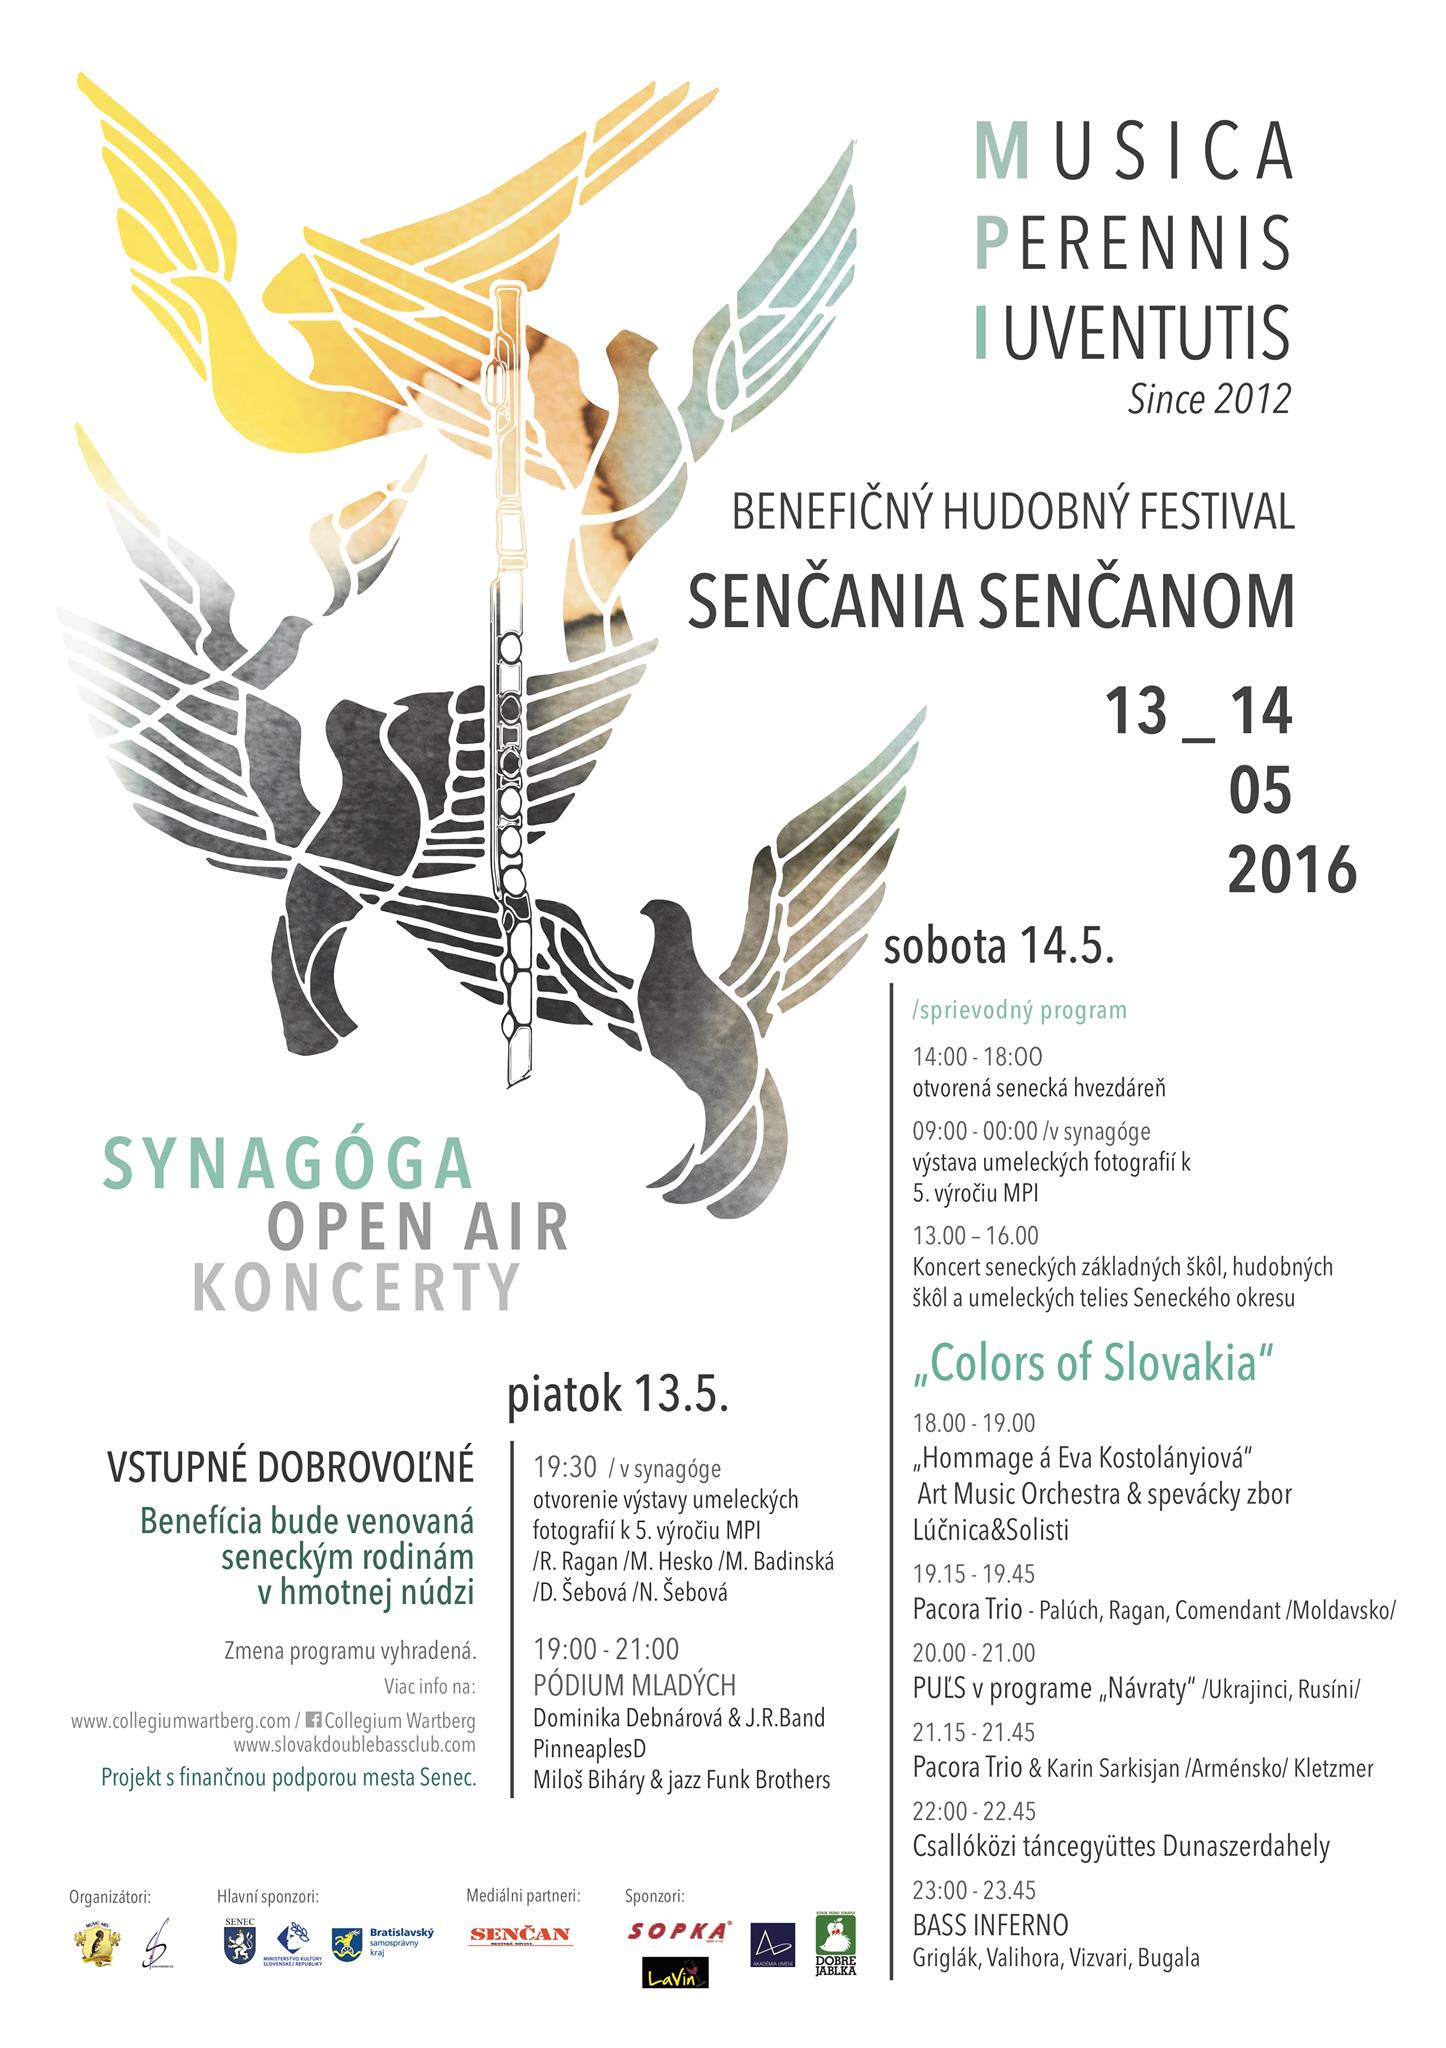 sencania sencanom 2016